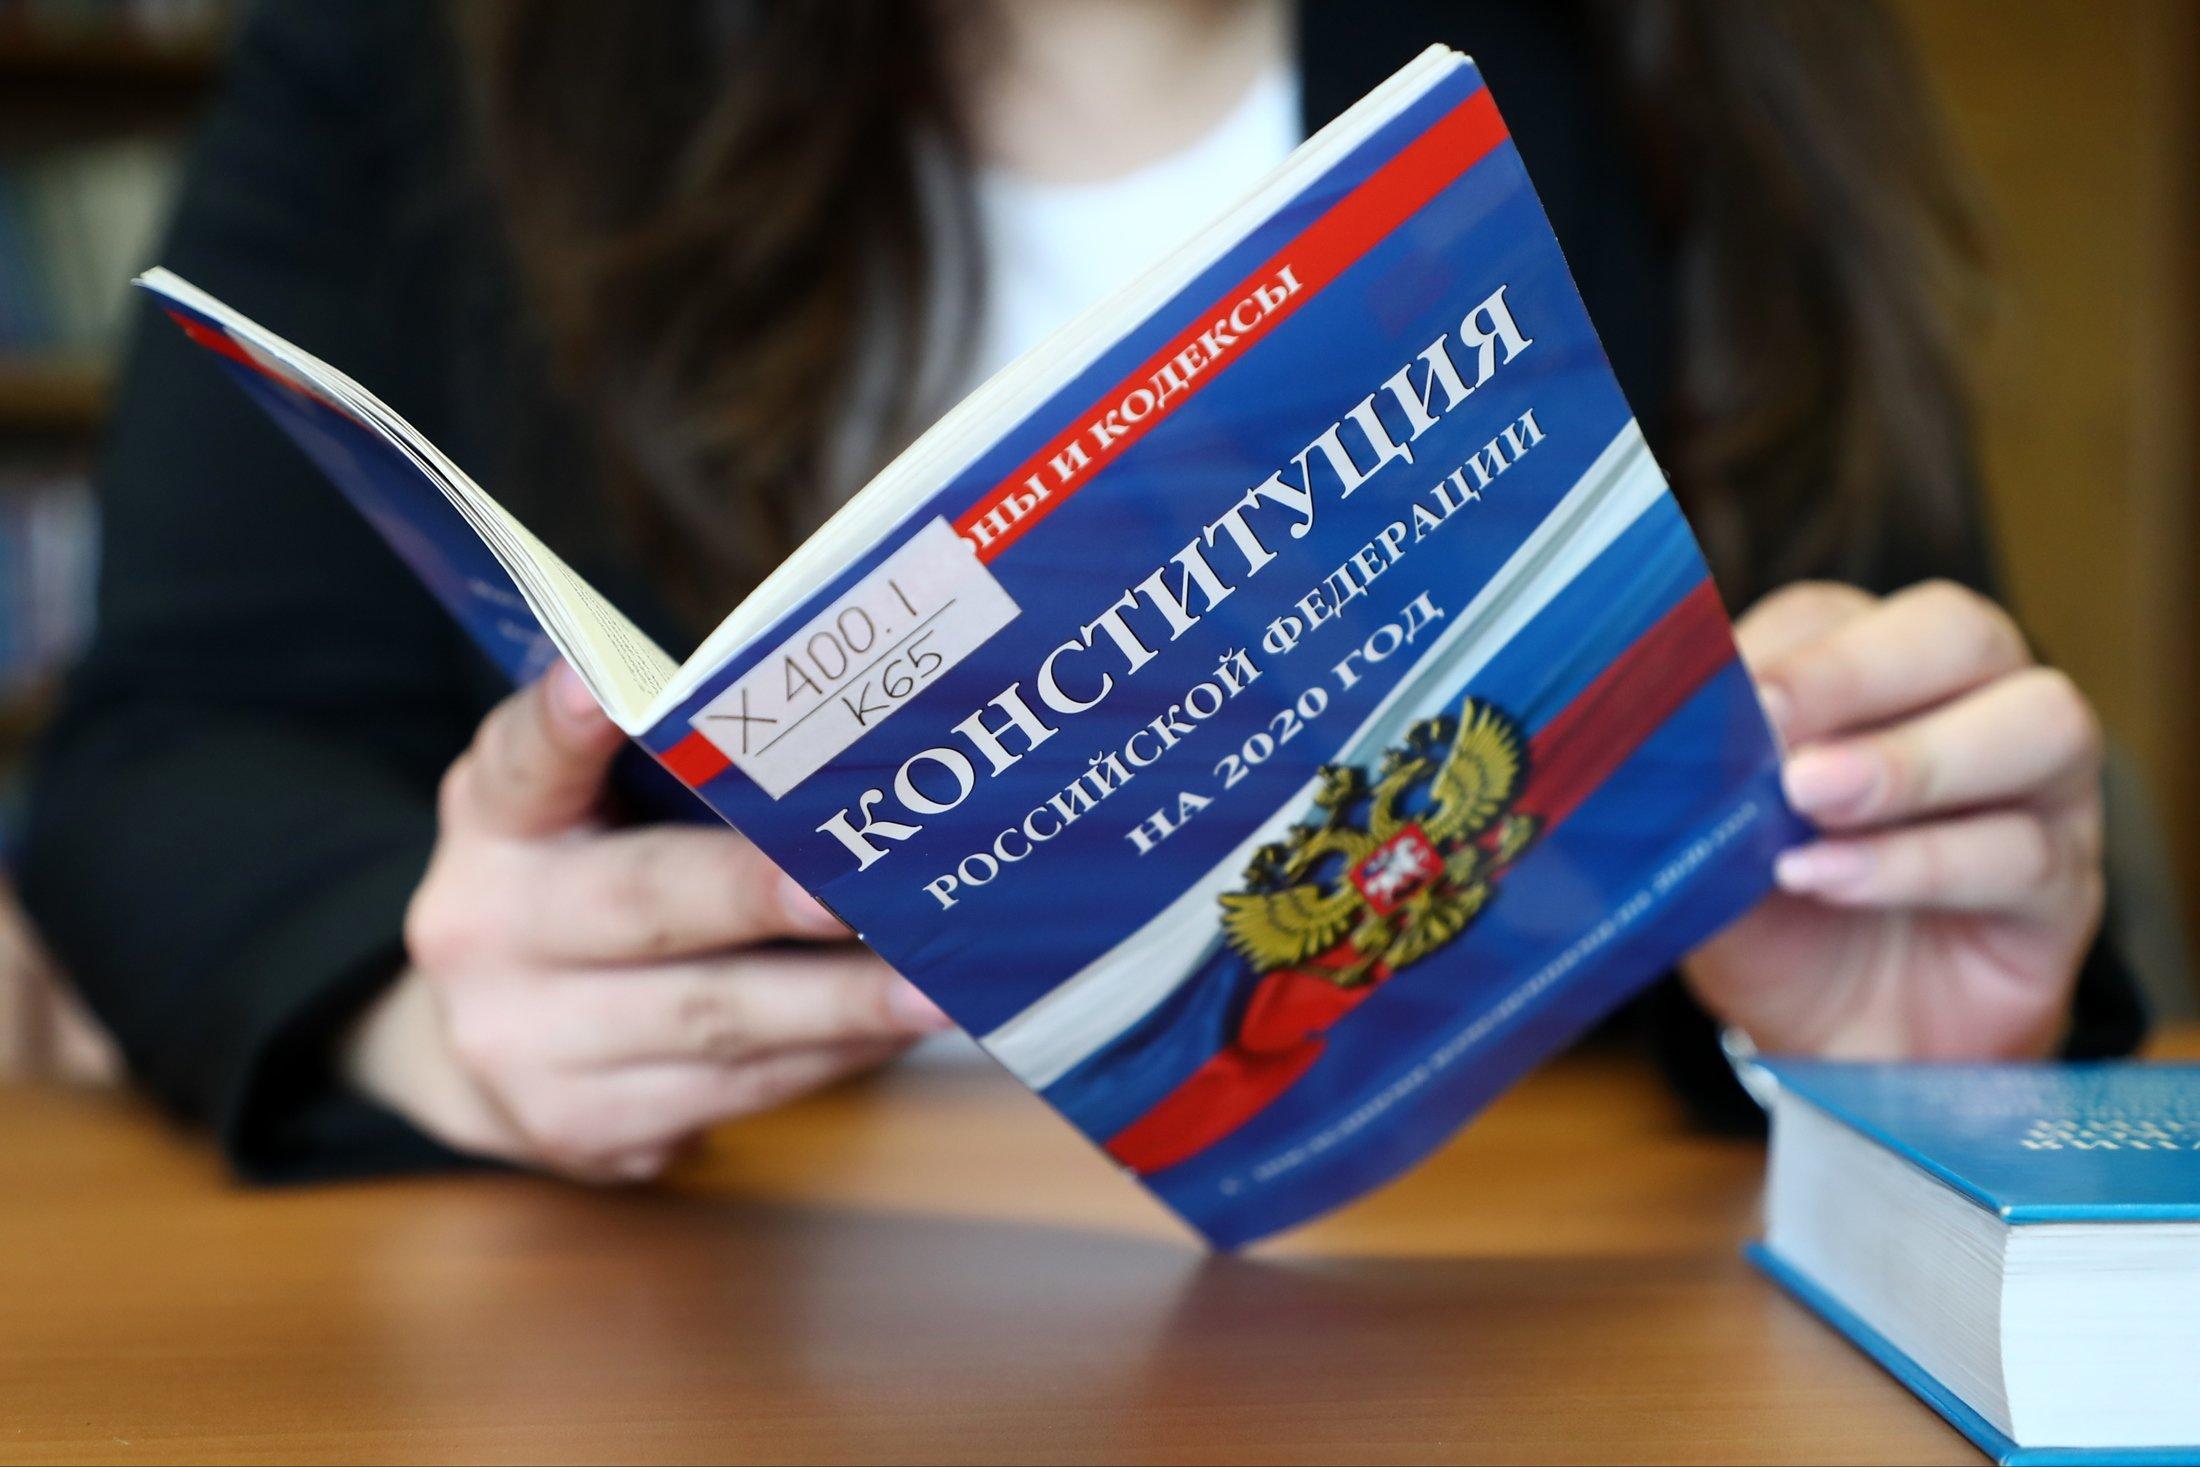 конституция 1977 г закрепляла положение